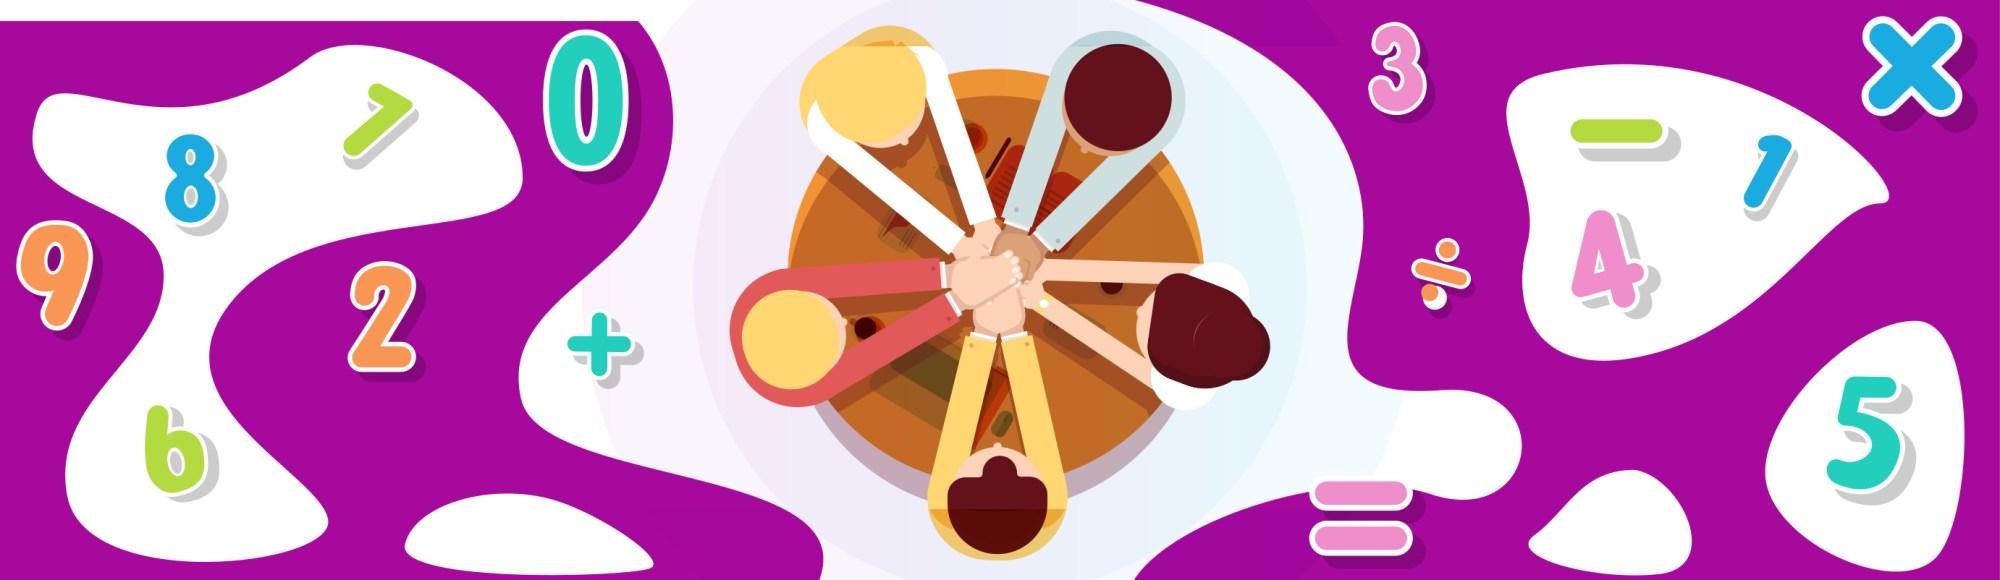 hight resolution of Second Grade Math Games: Team Building Activities - ArgoPrep